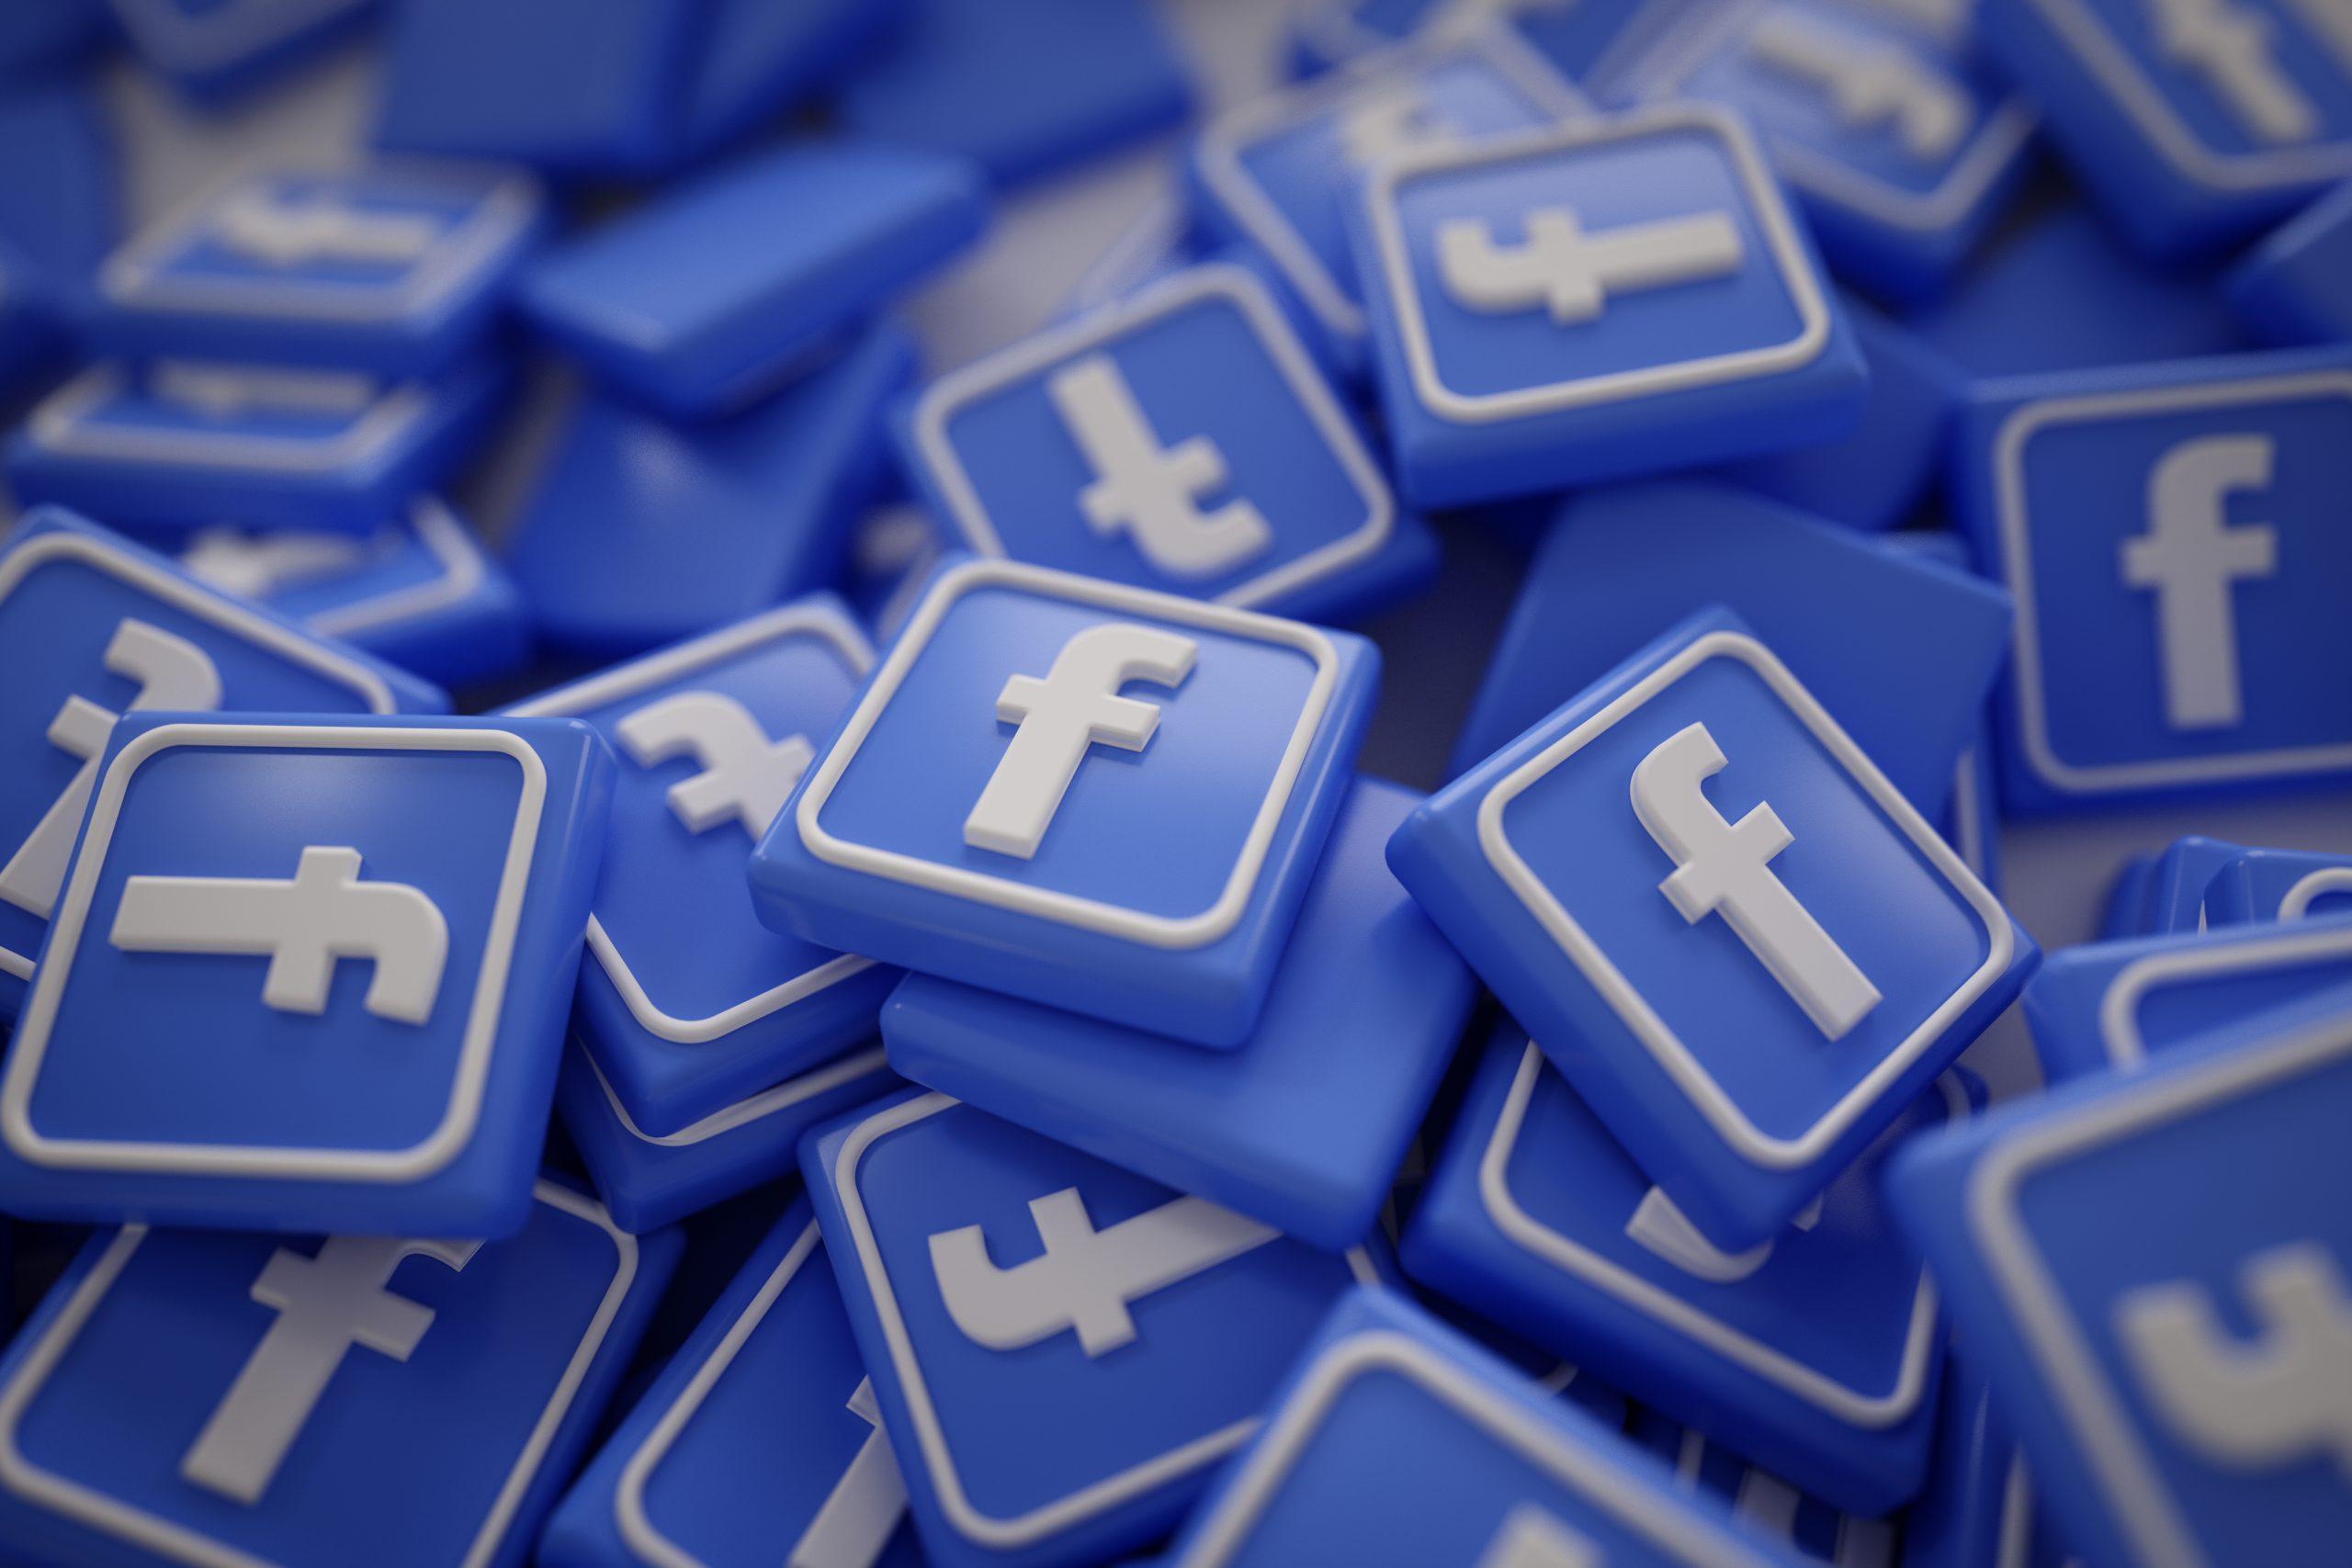 pile-3d-facebook-logos-scaled.jpg